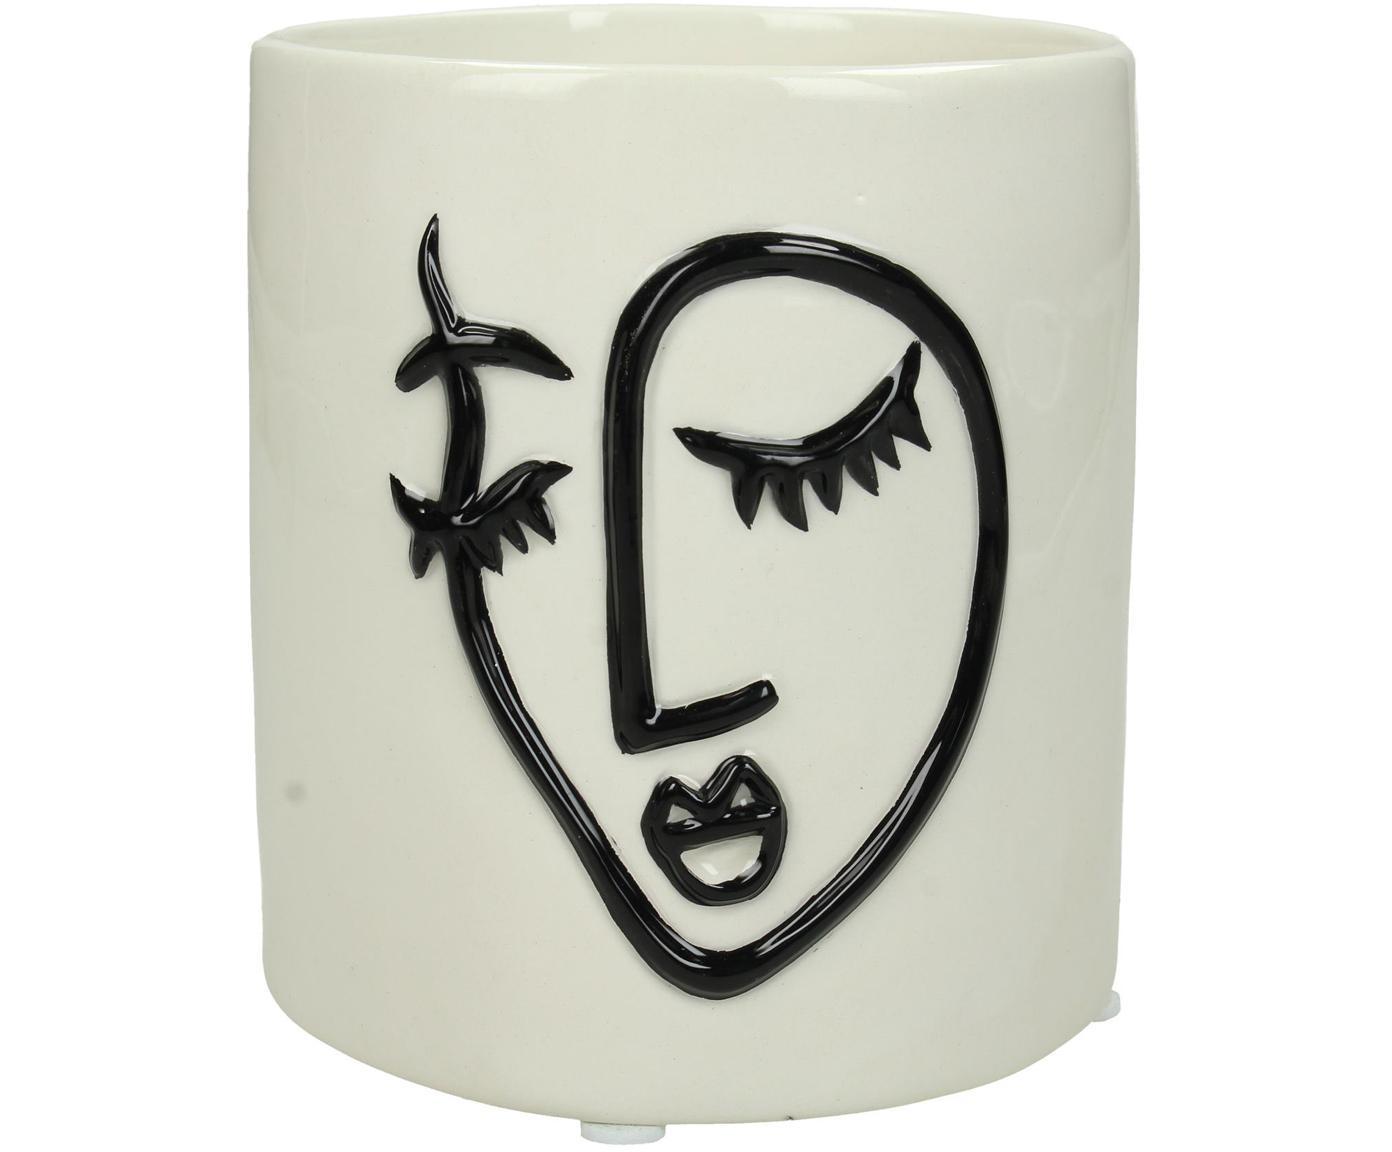 Portavaso Face, Dolomite, Bianco latteo, nero, Ø 12 x Alt. 13 cm